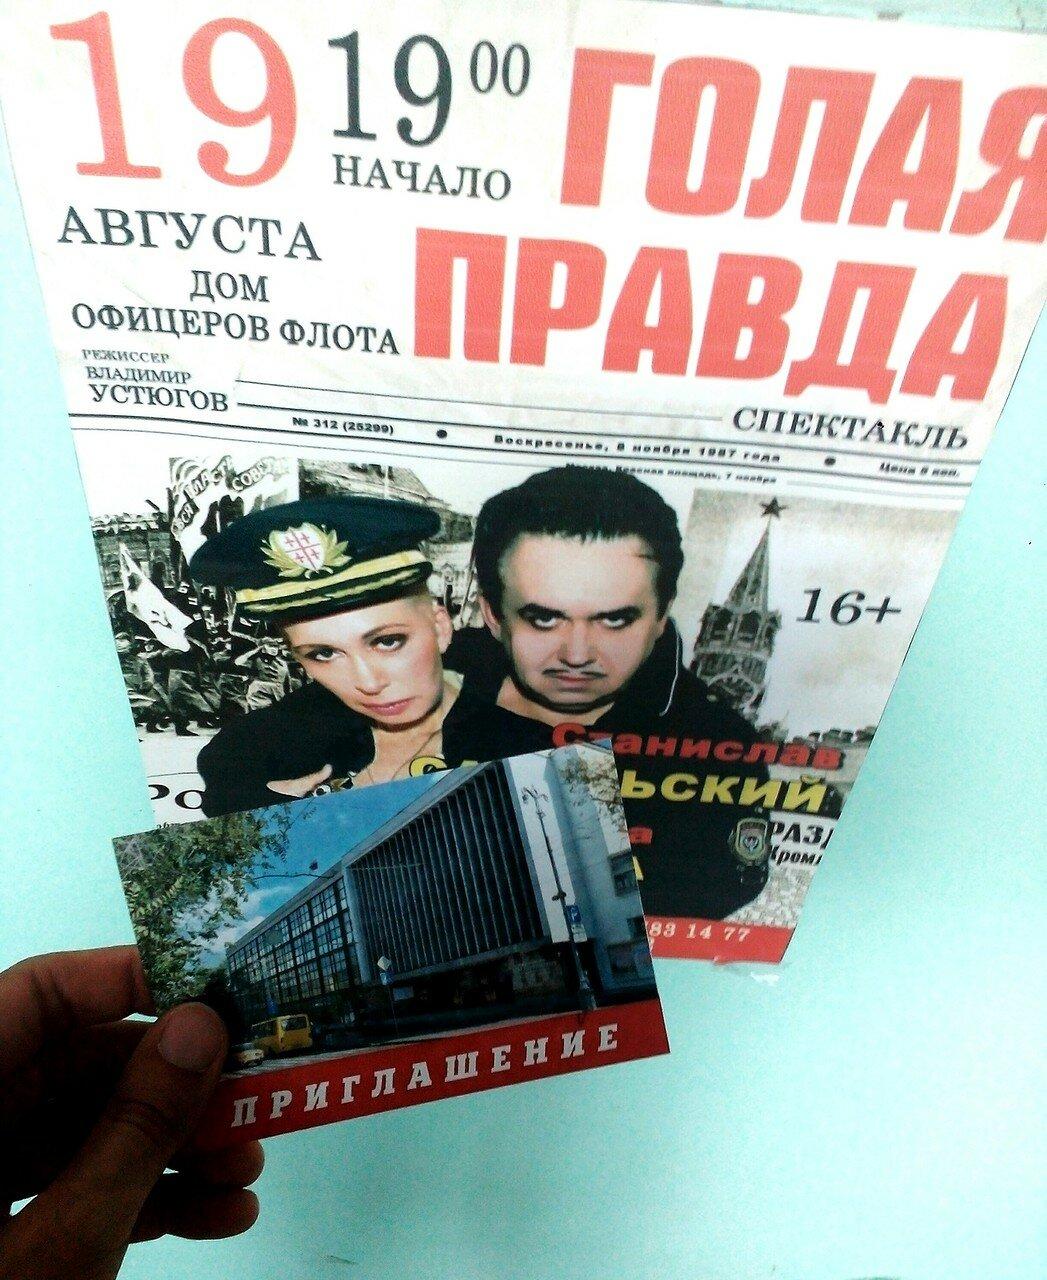 https://img-fotki.yandex.ru/get/62069/39067198.19d/0_c0cf9_25b4770f_XXXL.jpg